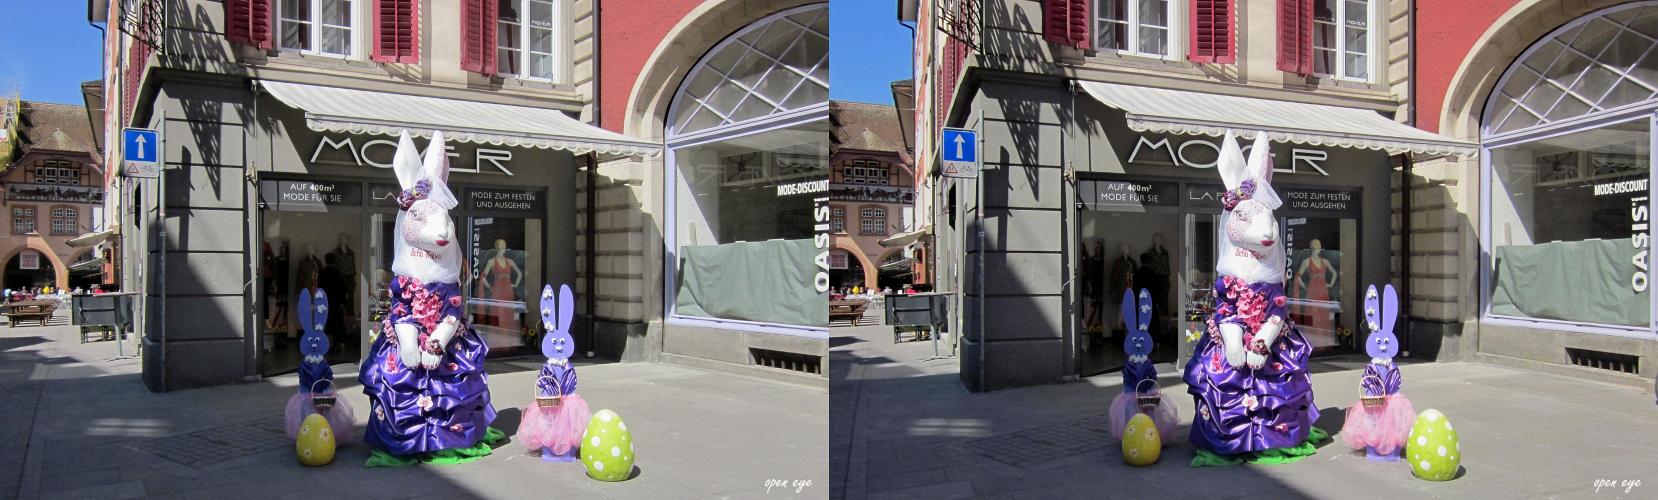 2. Platz 2014 Bella Festina Osterhase in Aarau / Kt. AG / Schweiz /  X View